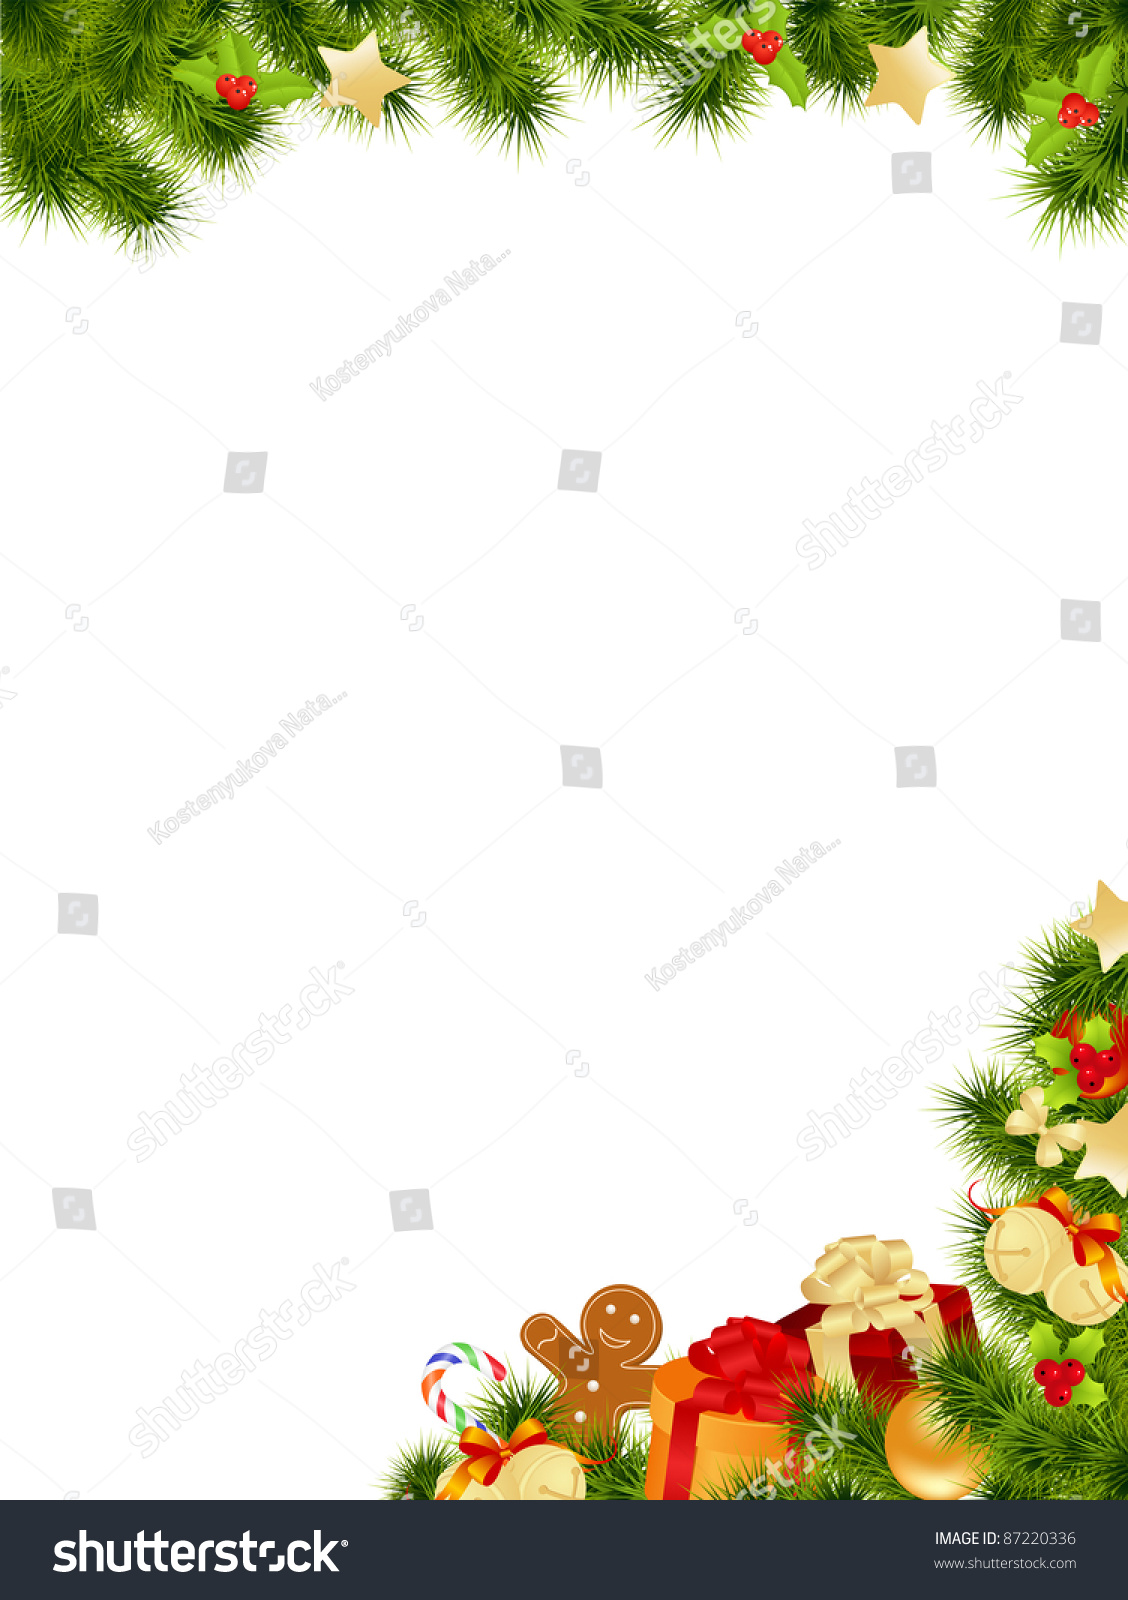 Christmas Card Background Vector Illustration Stock Vector (Royalty ...